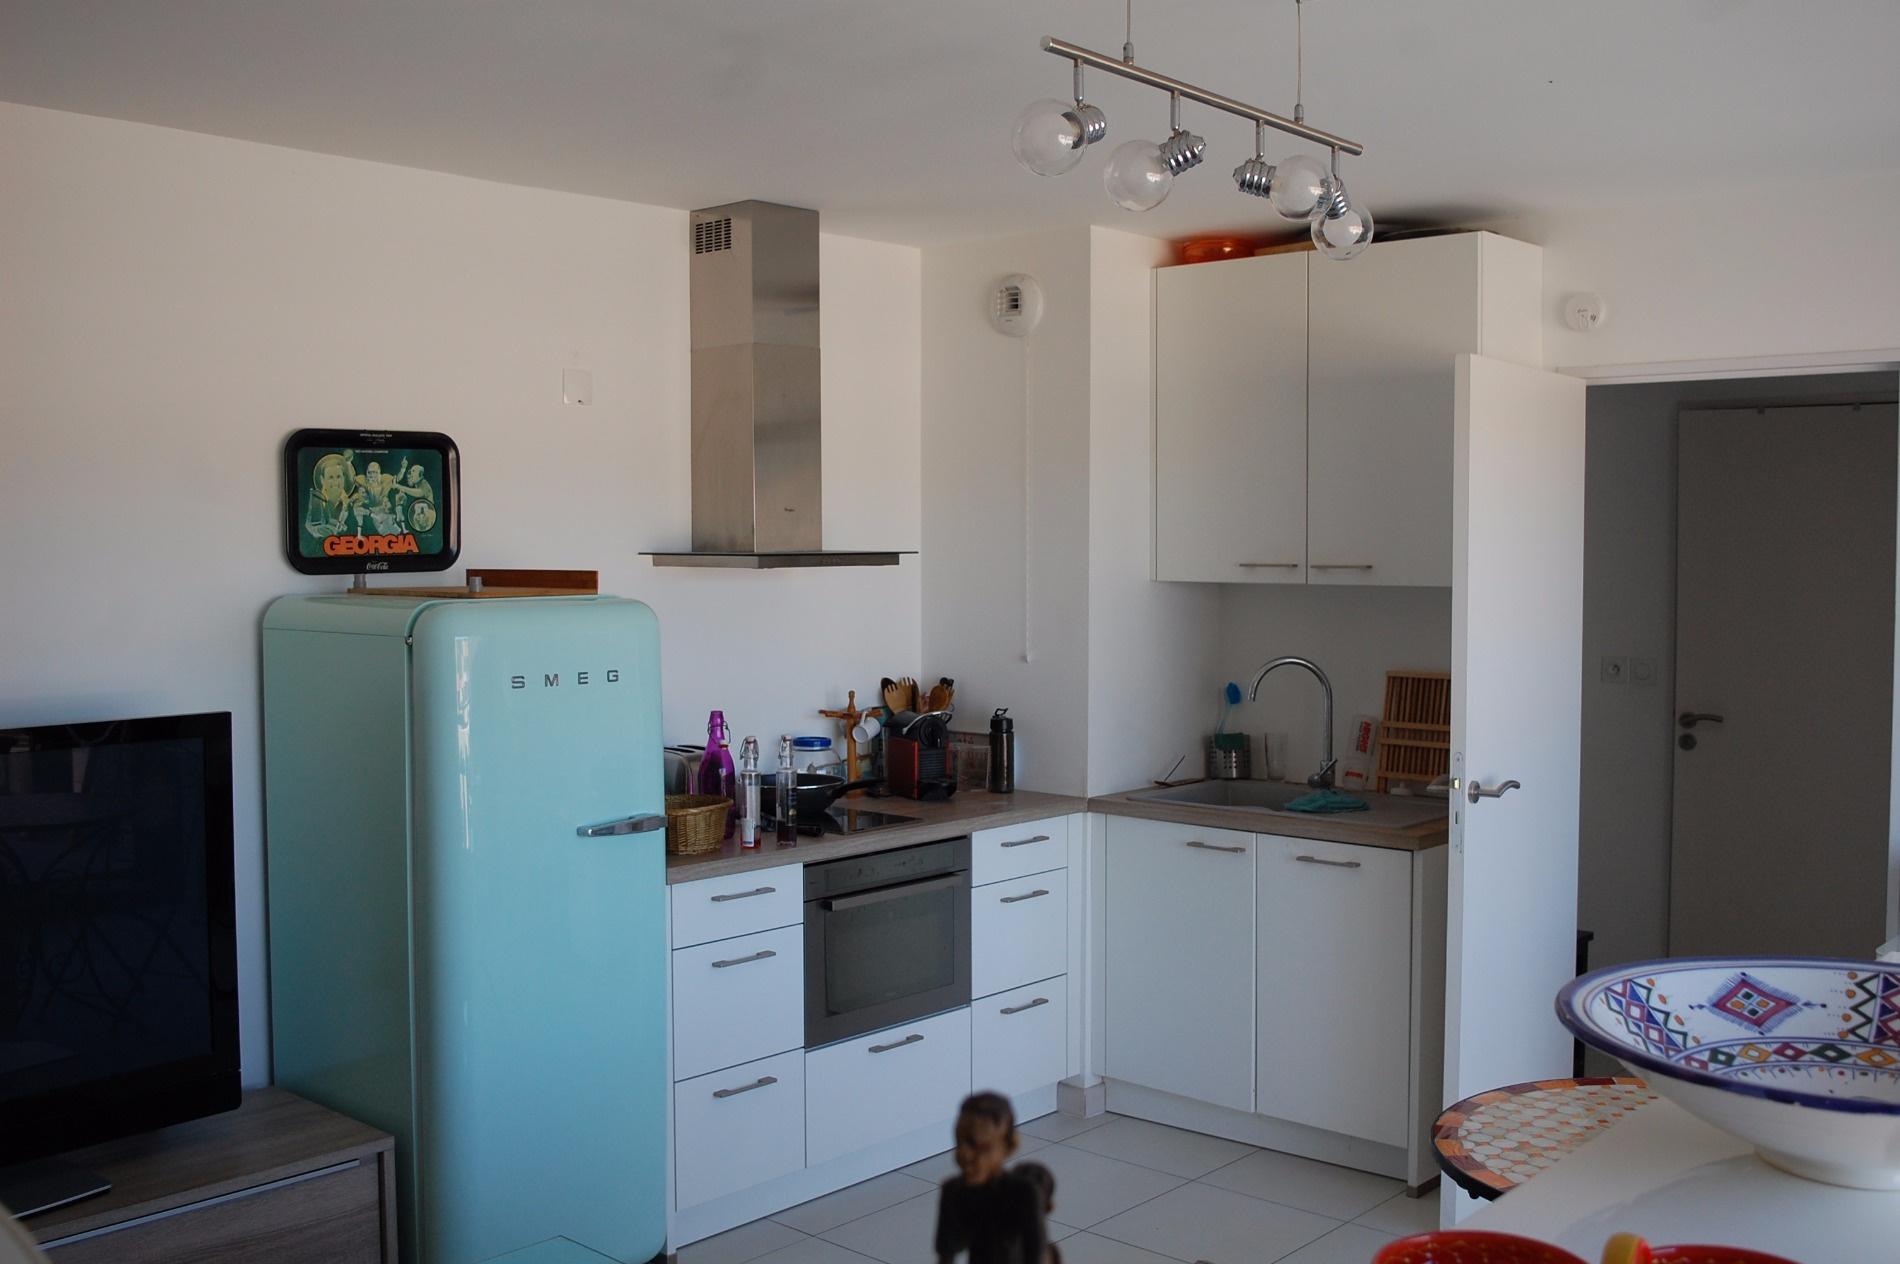 vente la ciotat appartement 150 m2 1 ier rang vue mer ascenseur garage